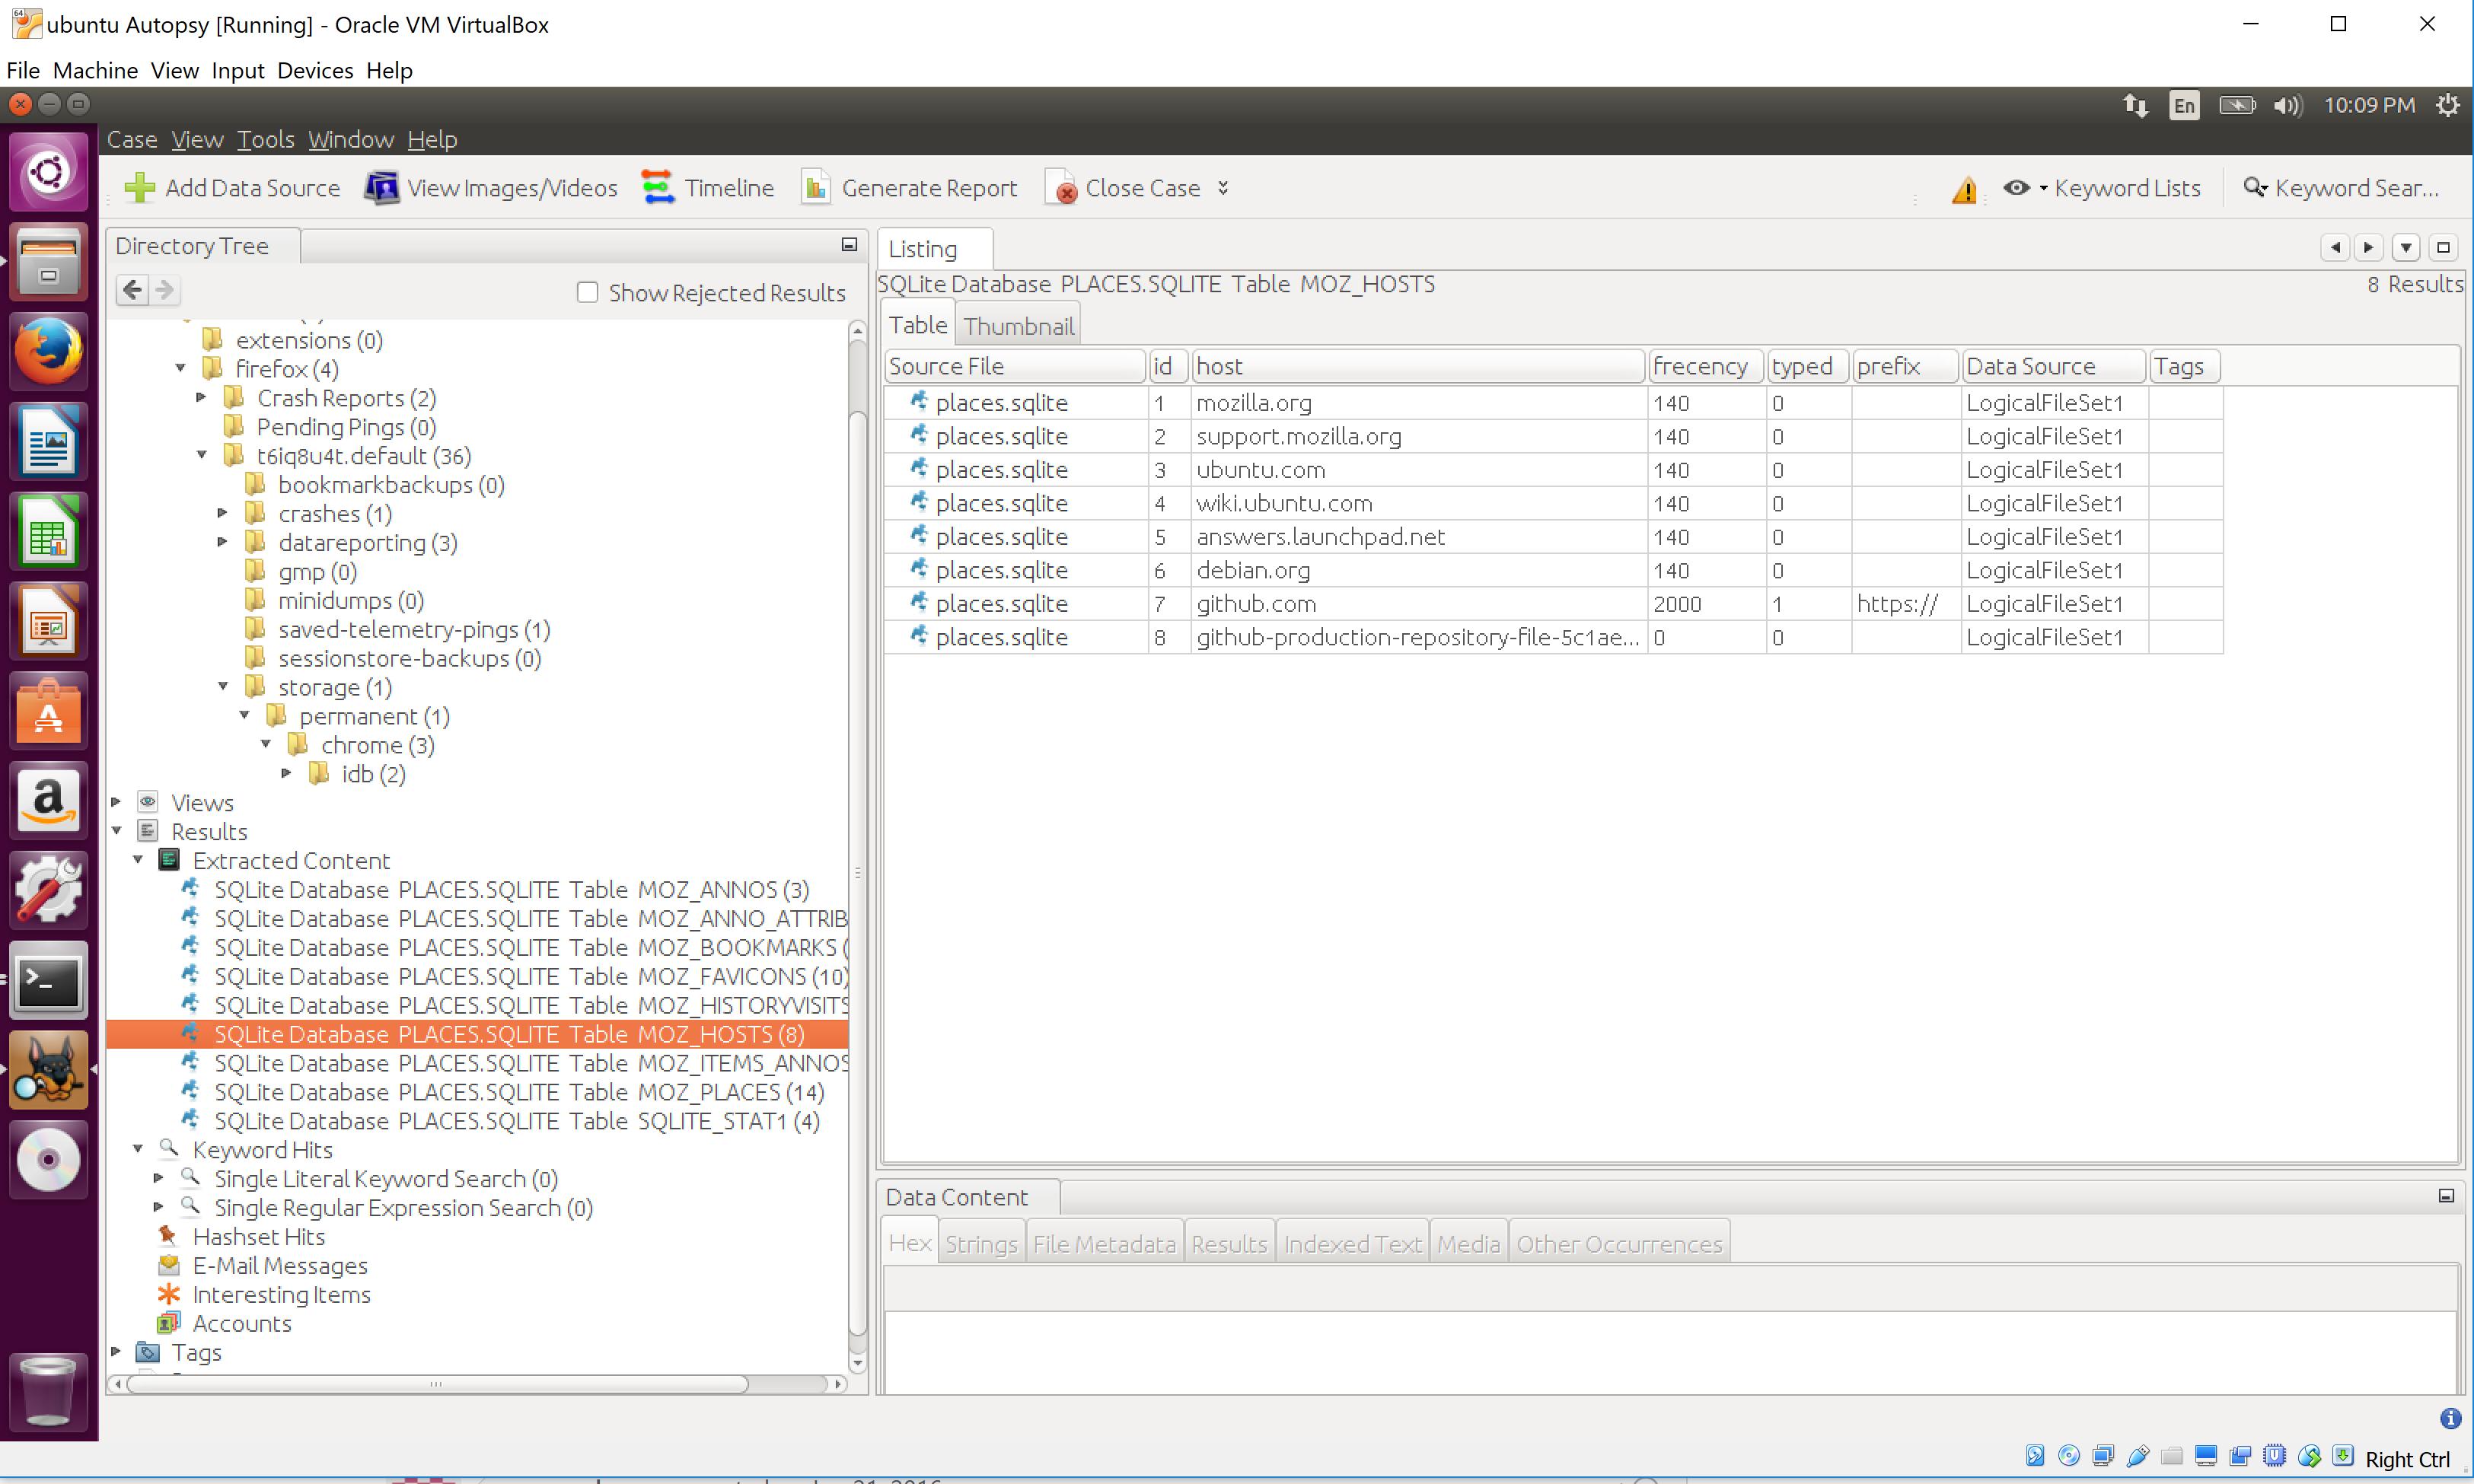 SQLite plugin questions · Issue #4 · markmckinnon/Autopsy-Plugins